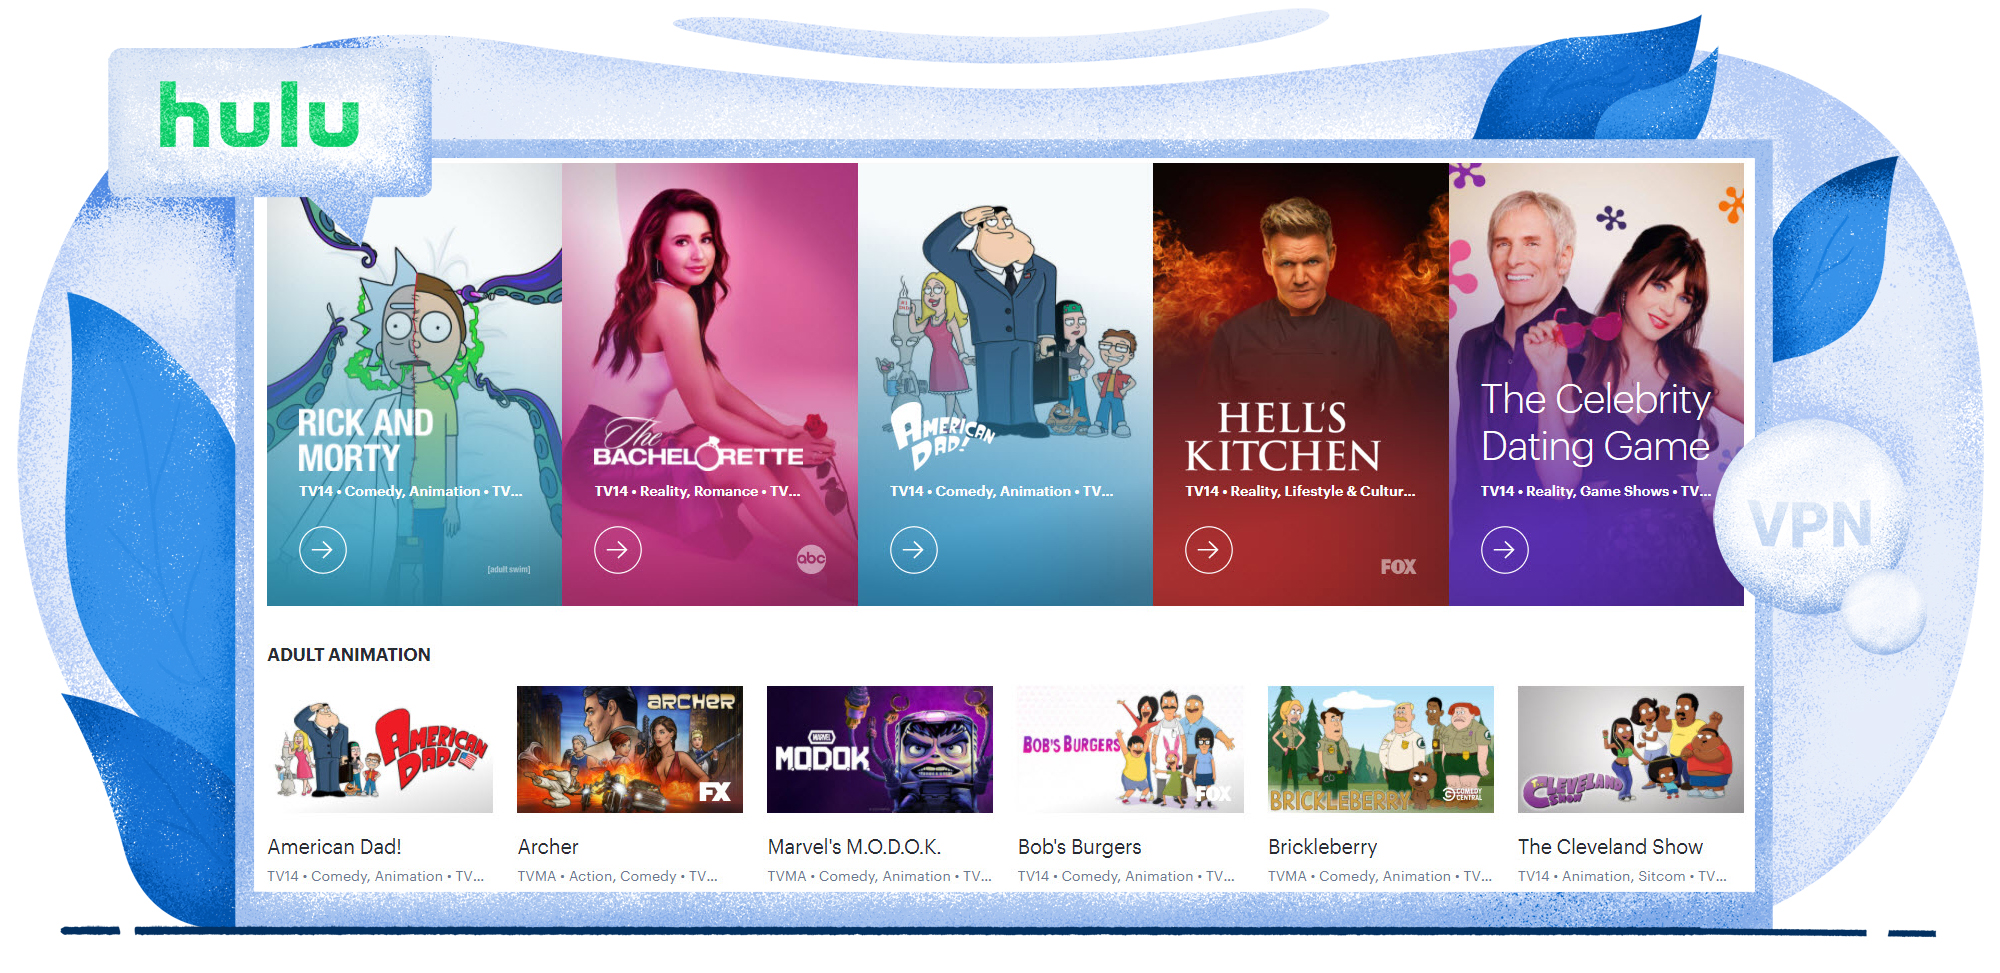 Seriale oryginalny dostępne na Hulu